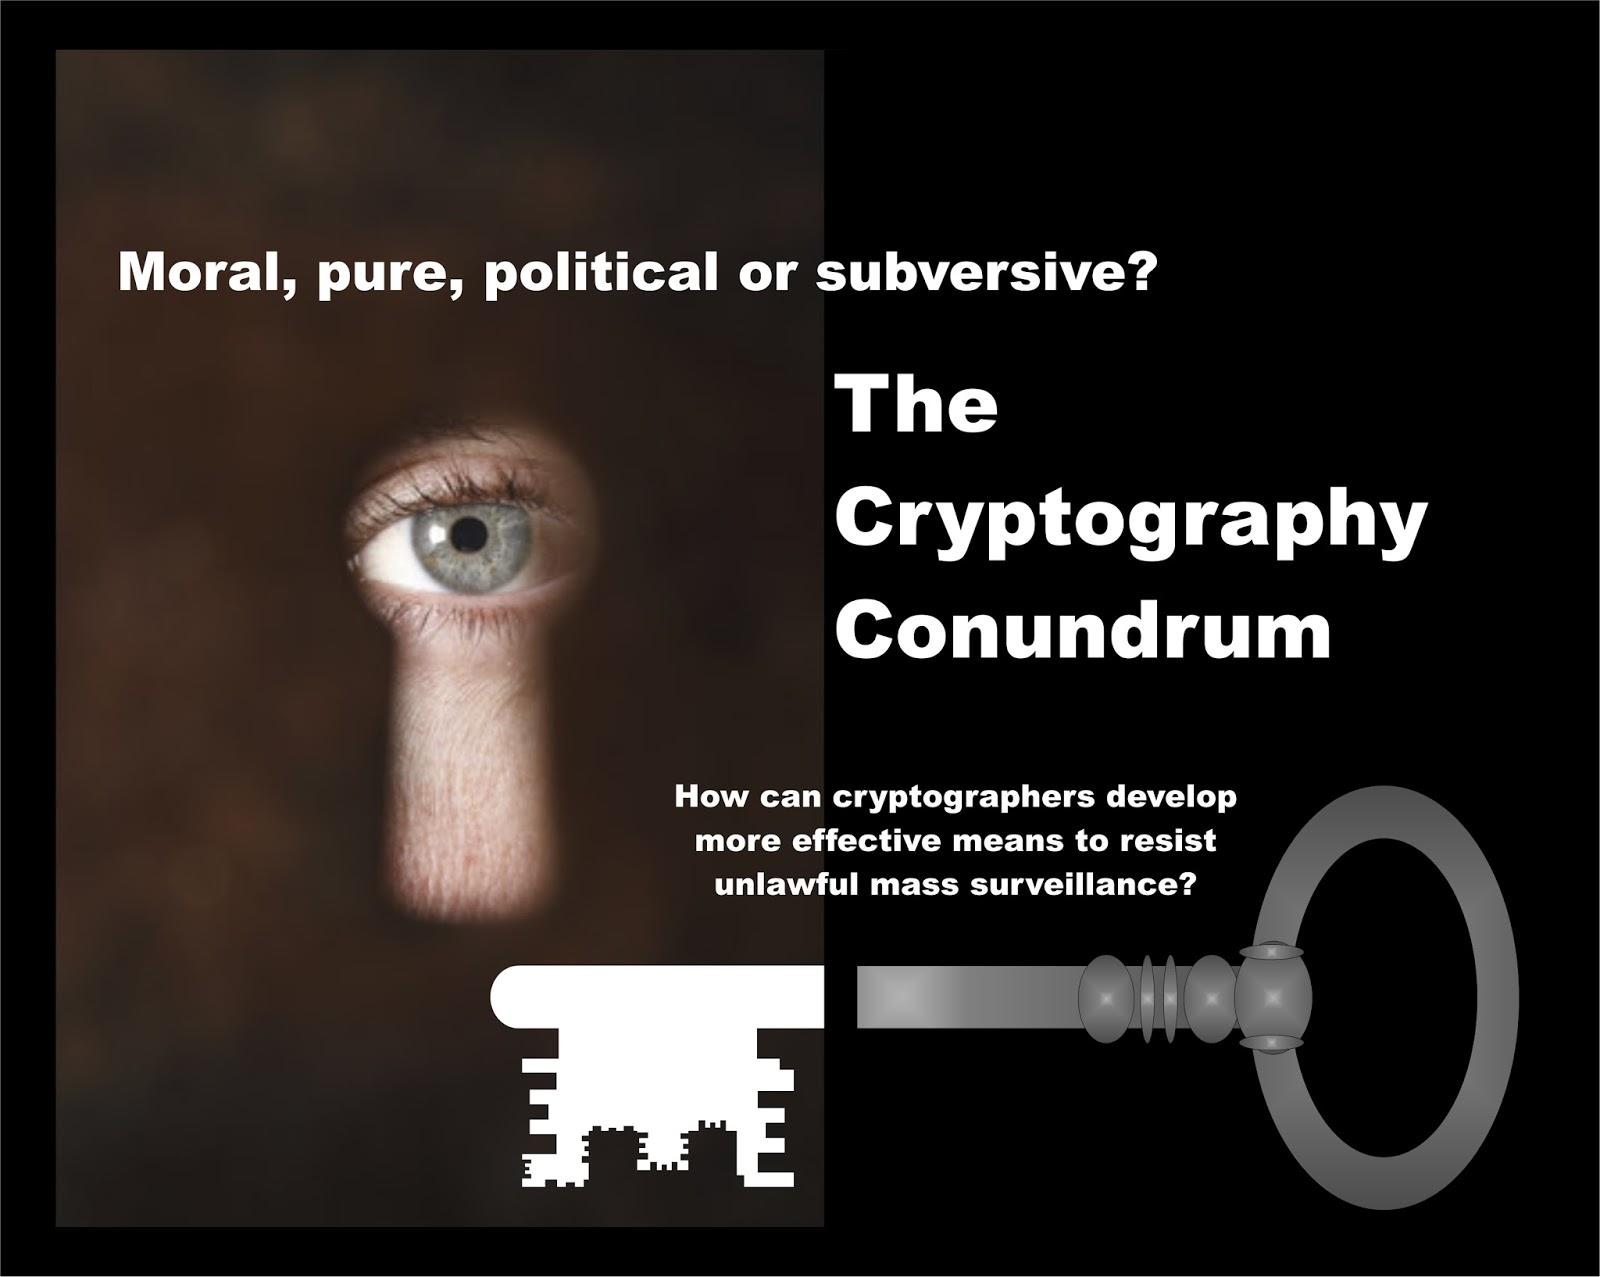 http://alcuinbramerton.blogspot.com/2015/12/the-cryptography-conundrum.html